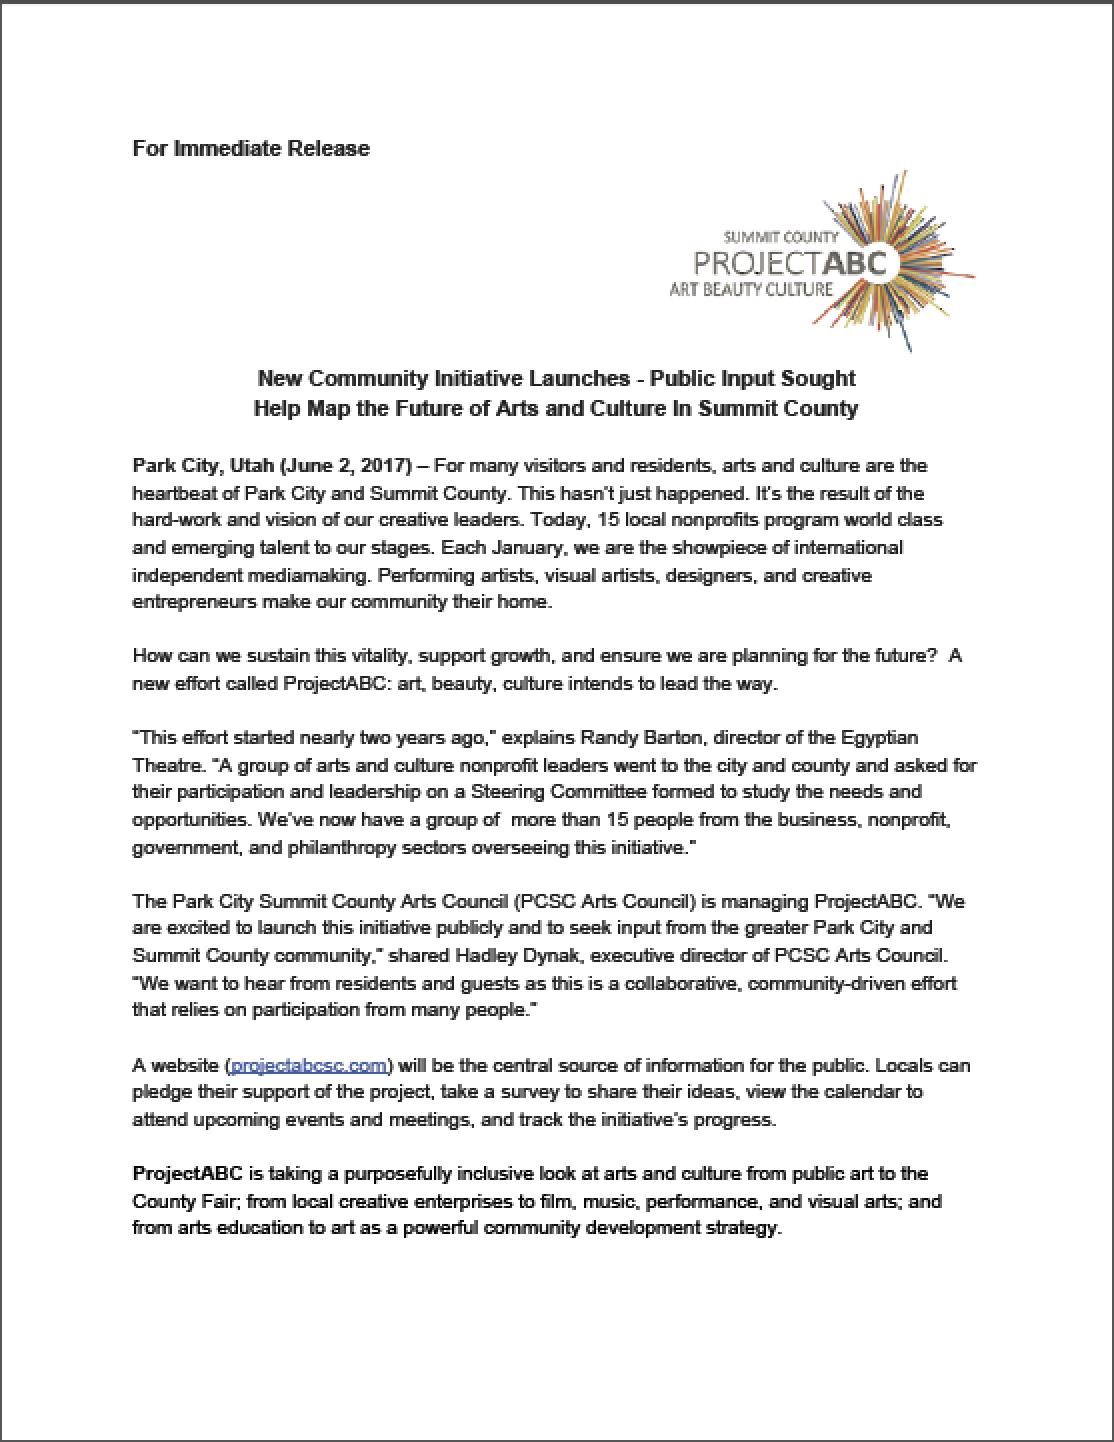 ProjectABC Press Release